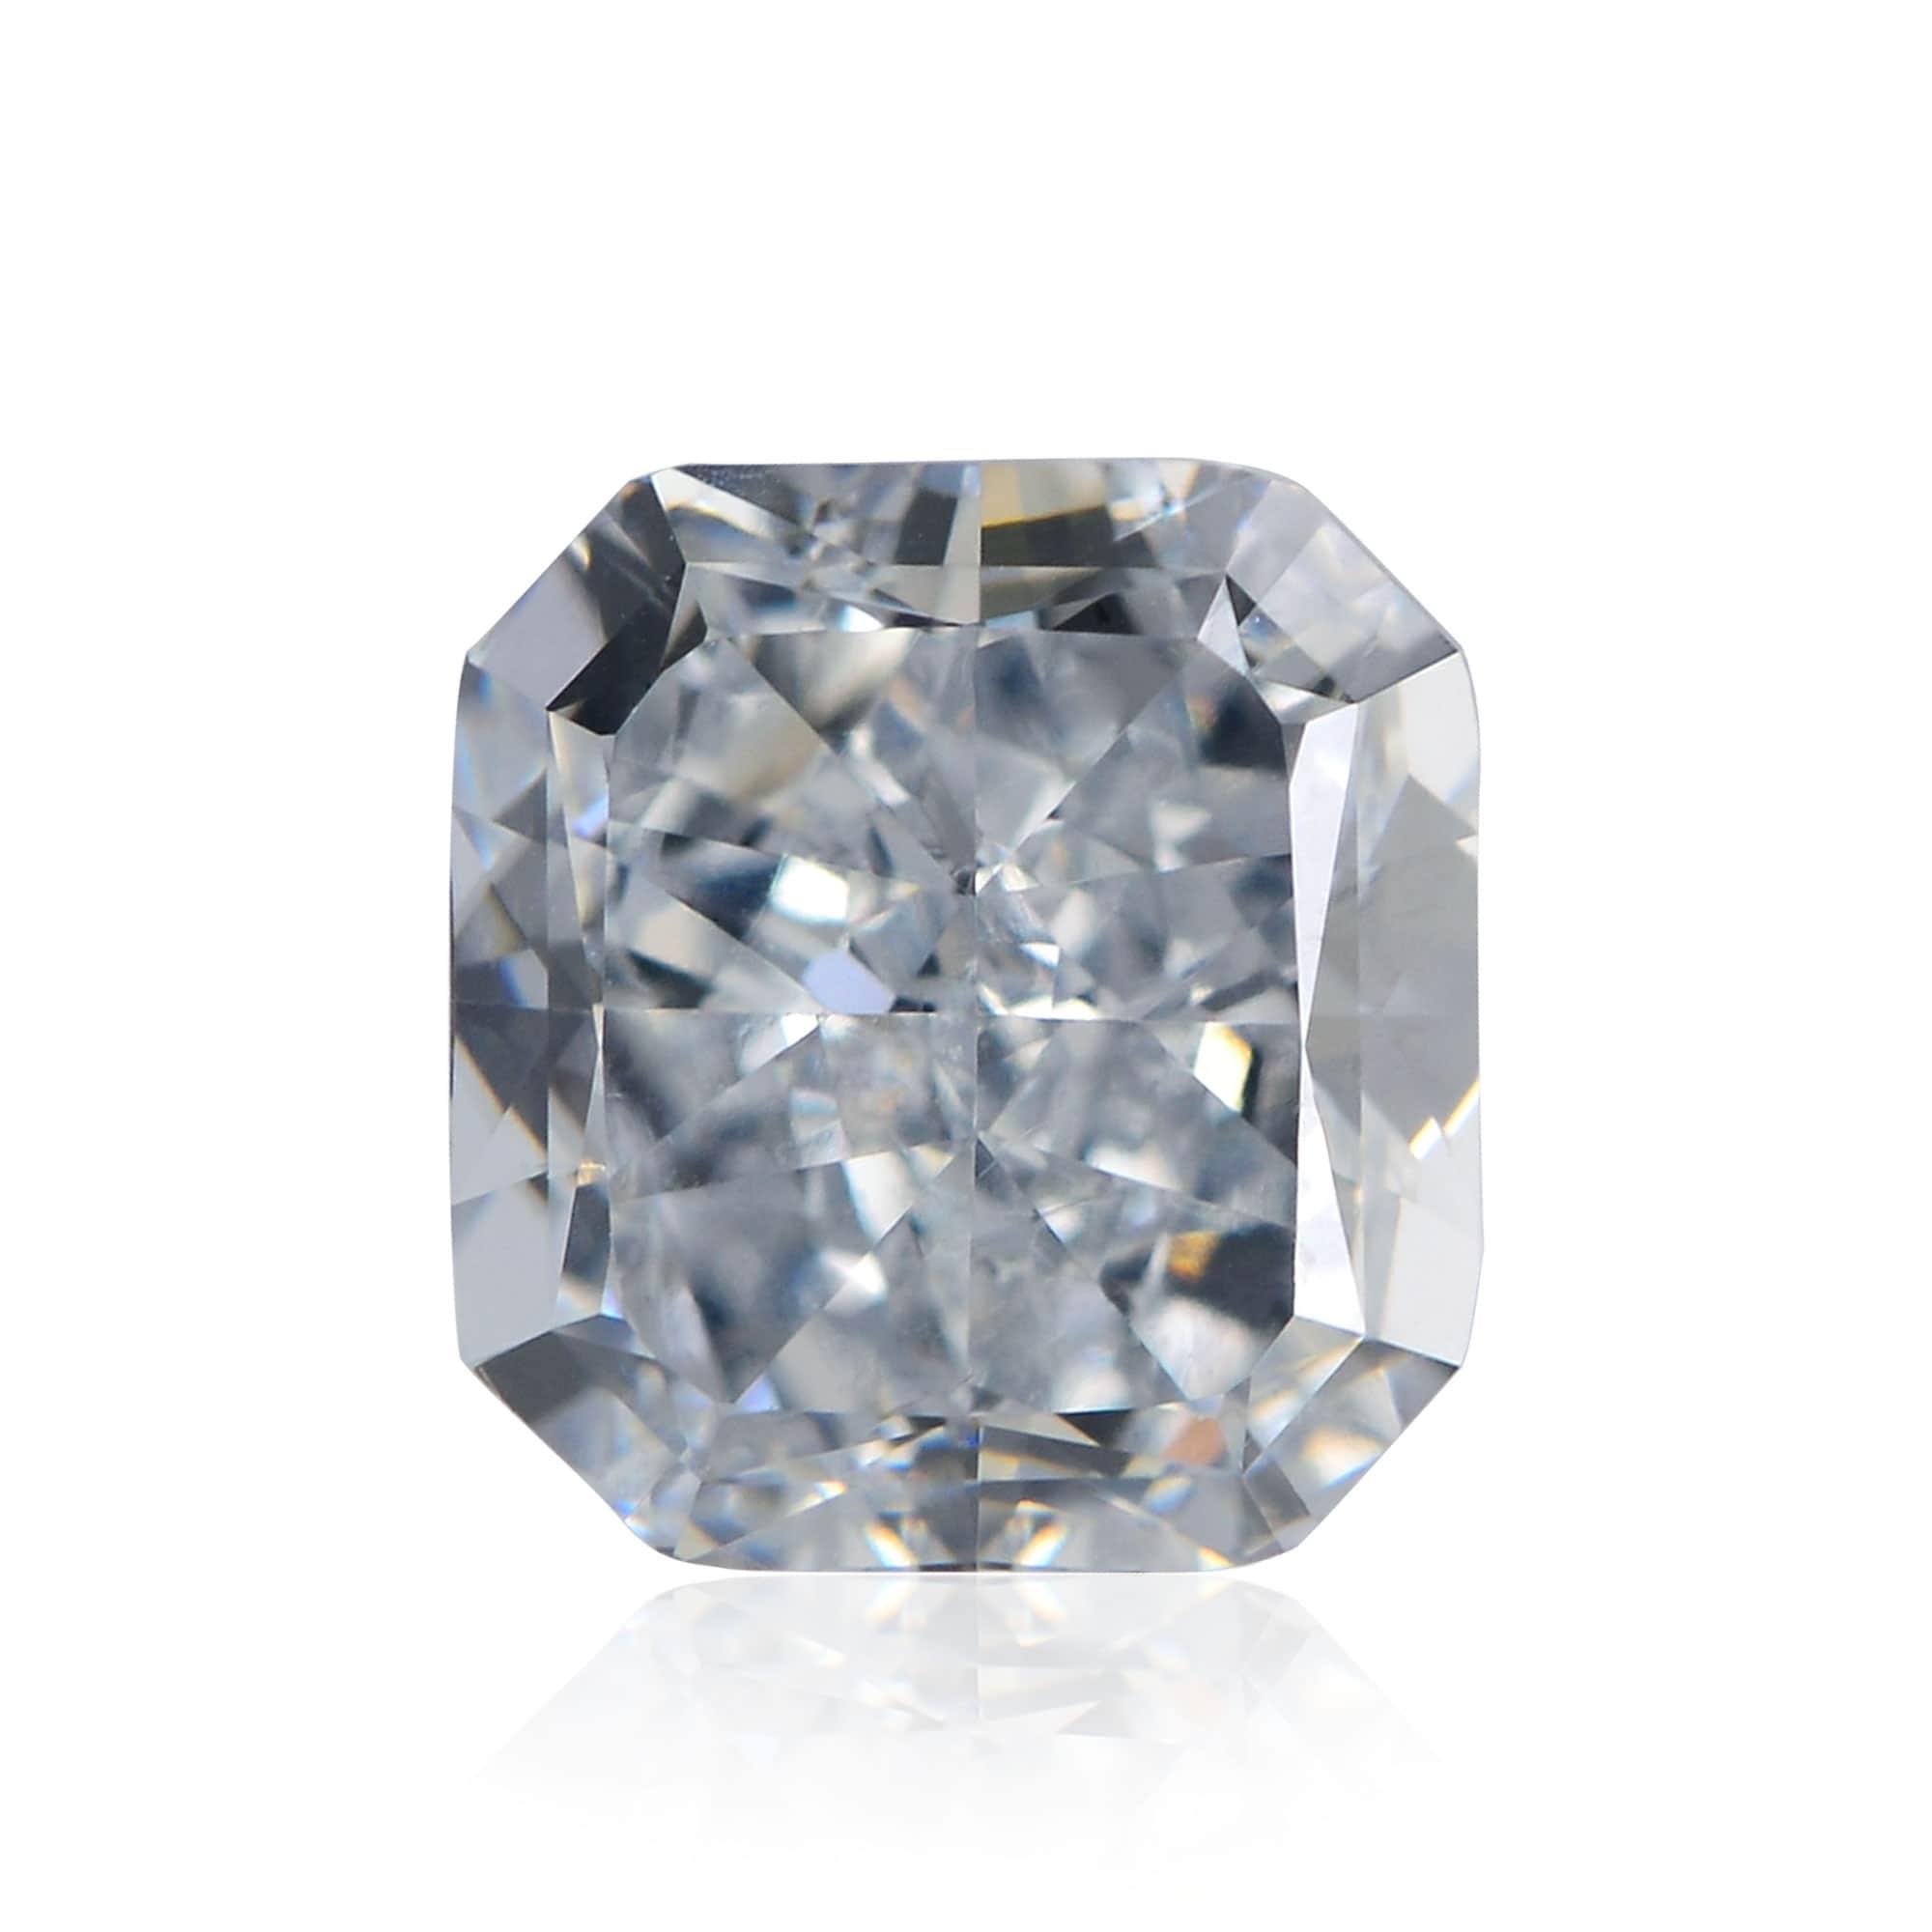 1.61 carat, Fancy Grayish Blue Diamond, Radiant Shape, VS2 Clarity, GIA, SKU 225785